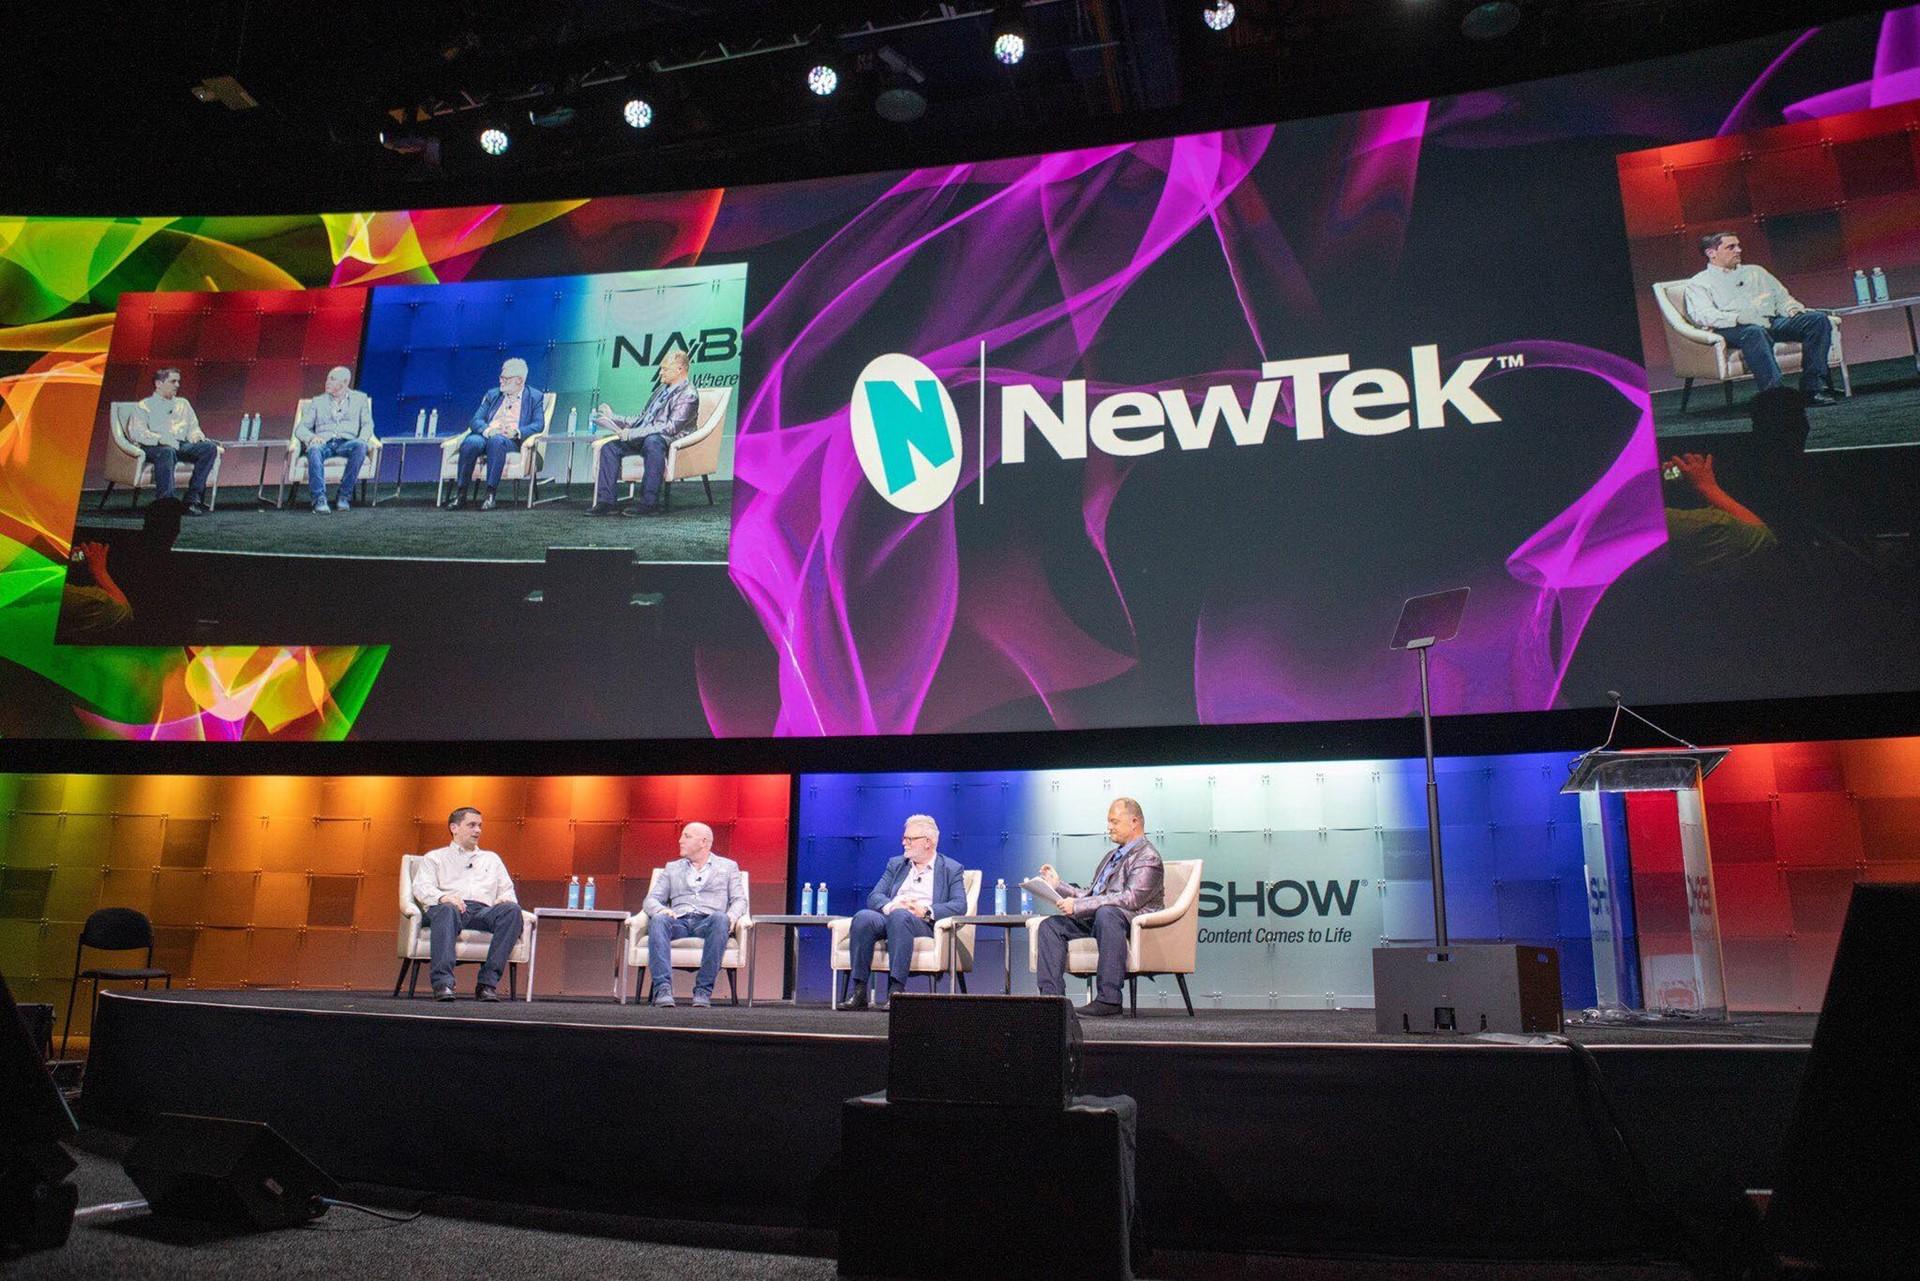 Vizrt acquires NewTek and releases Viz Engine 4 - Media City Bergen